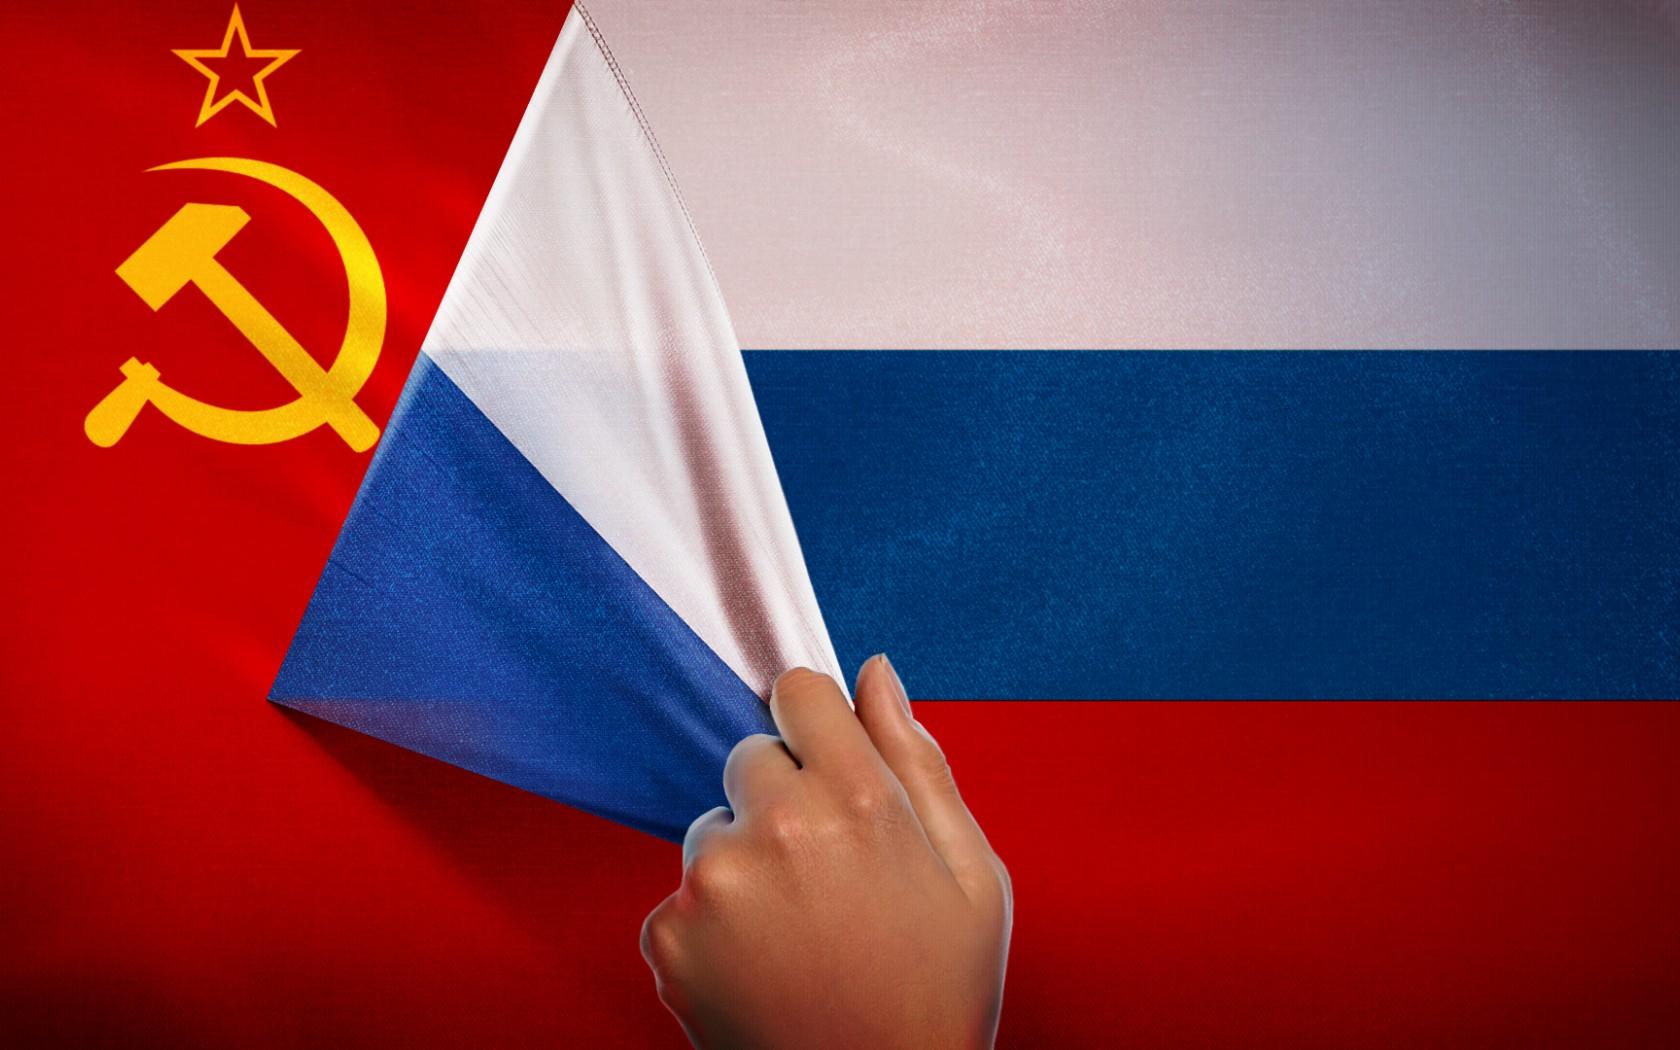 soviet x russia